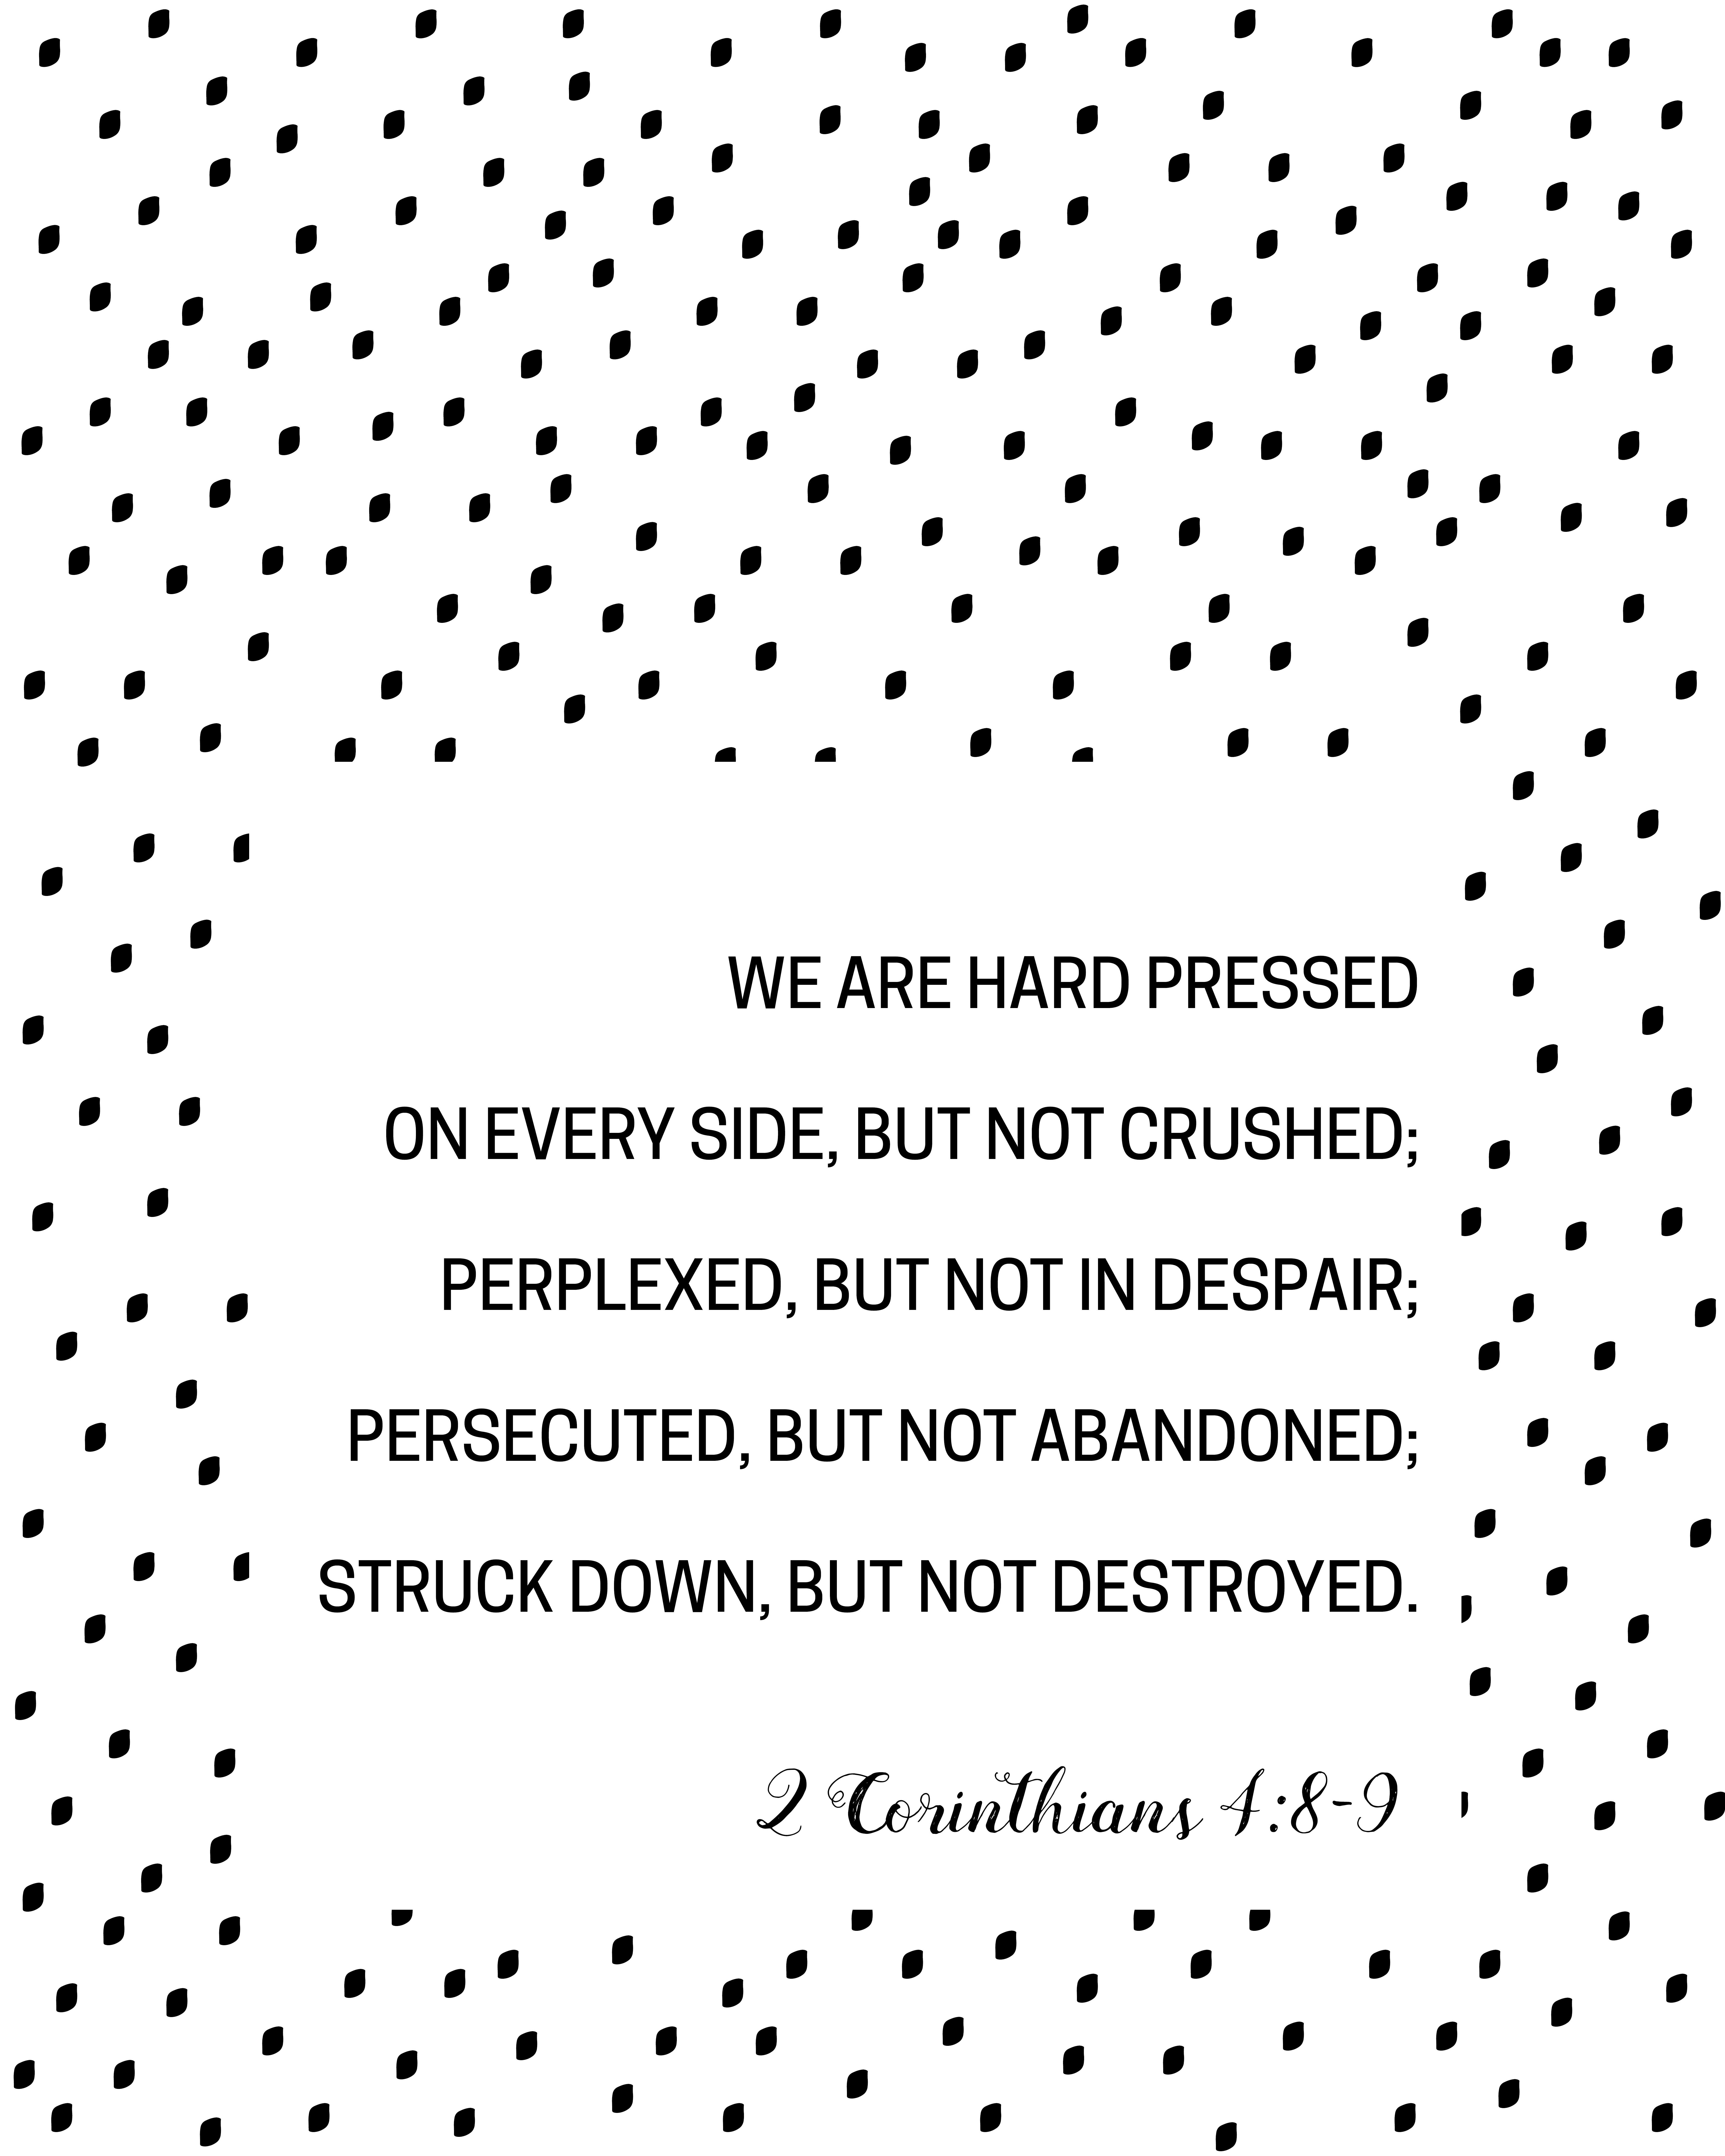 2 corinthians 2:8-9